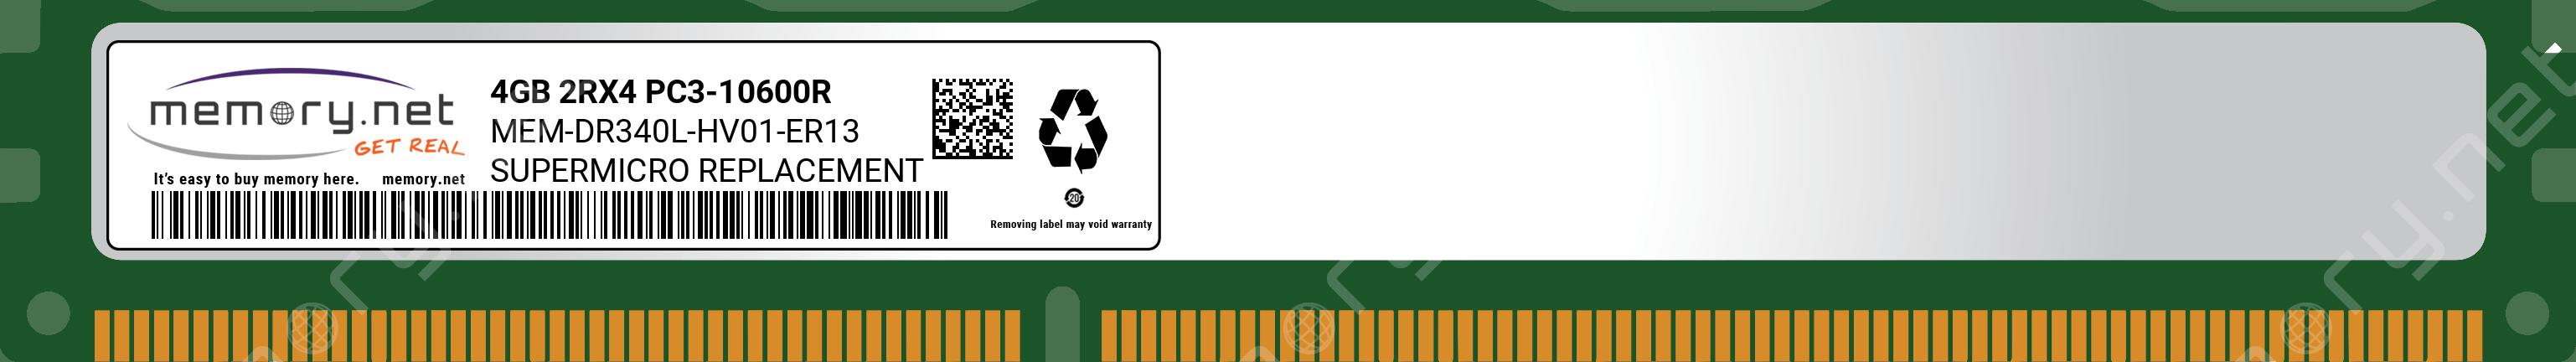 MEM-DR340L-HV01-ER13